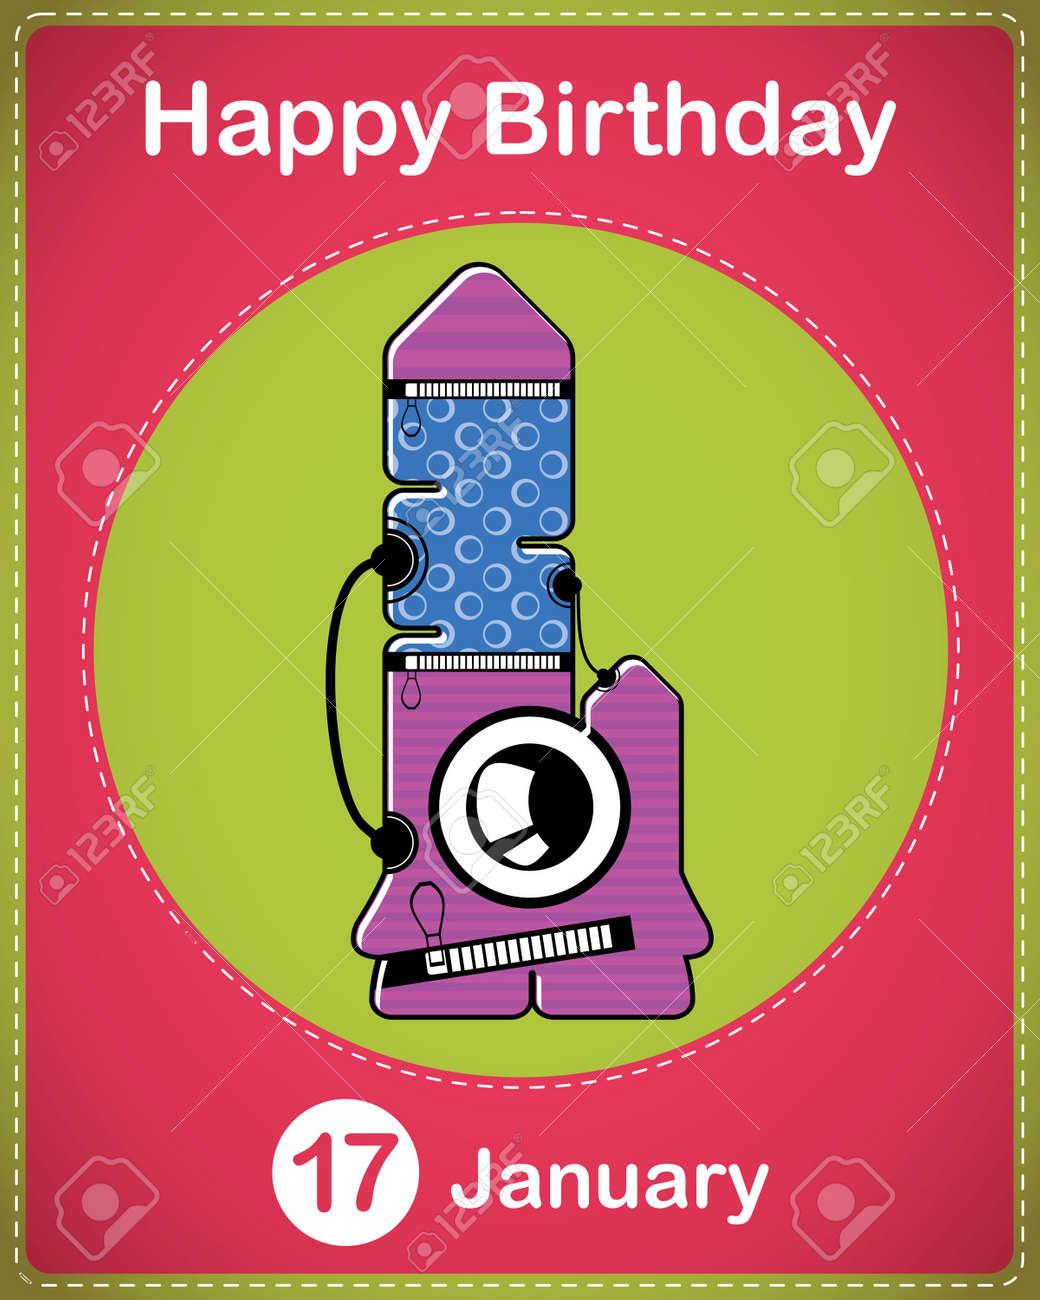 Happy birthday card with cute cartoon monster Stock Vector - 17577839